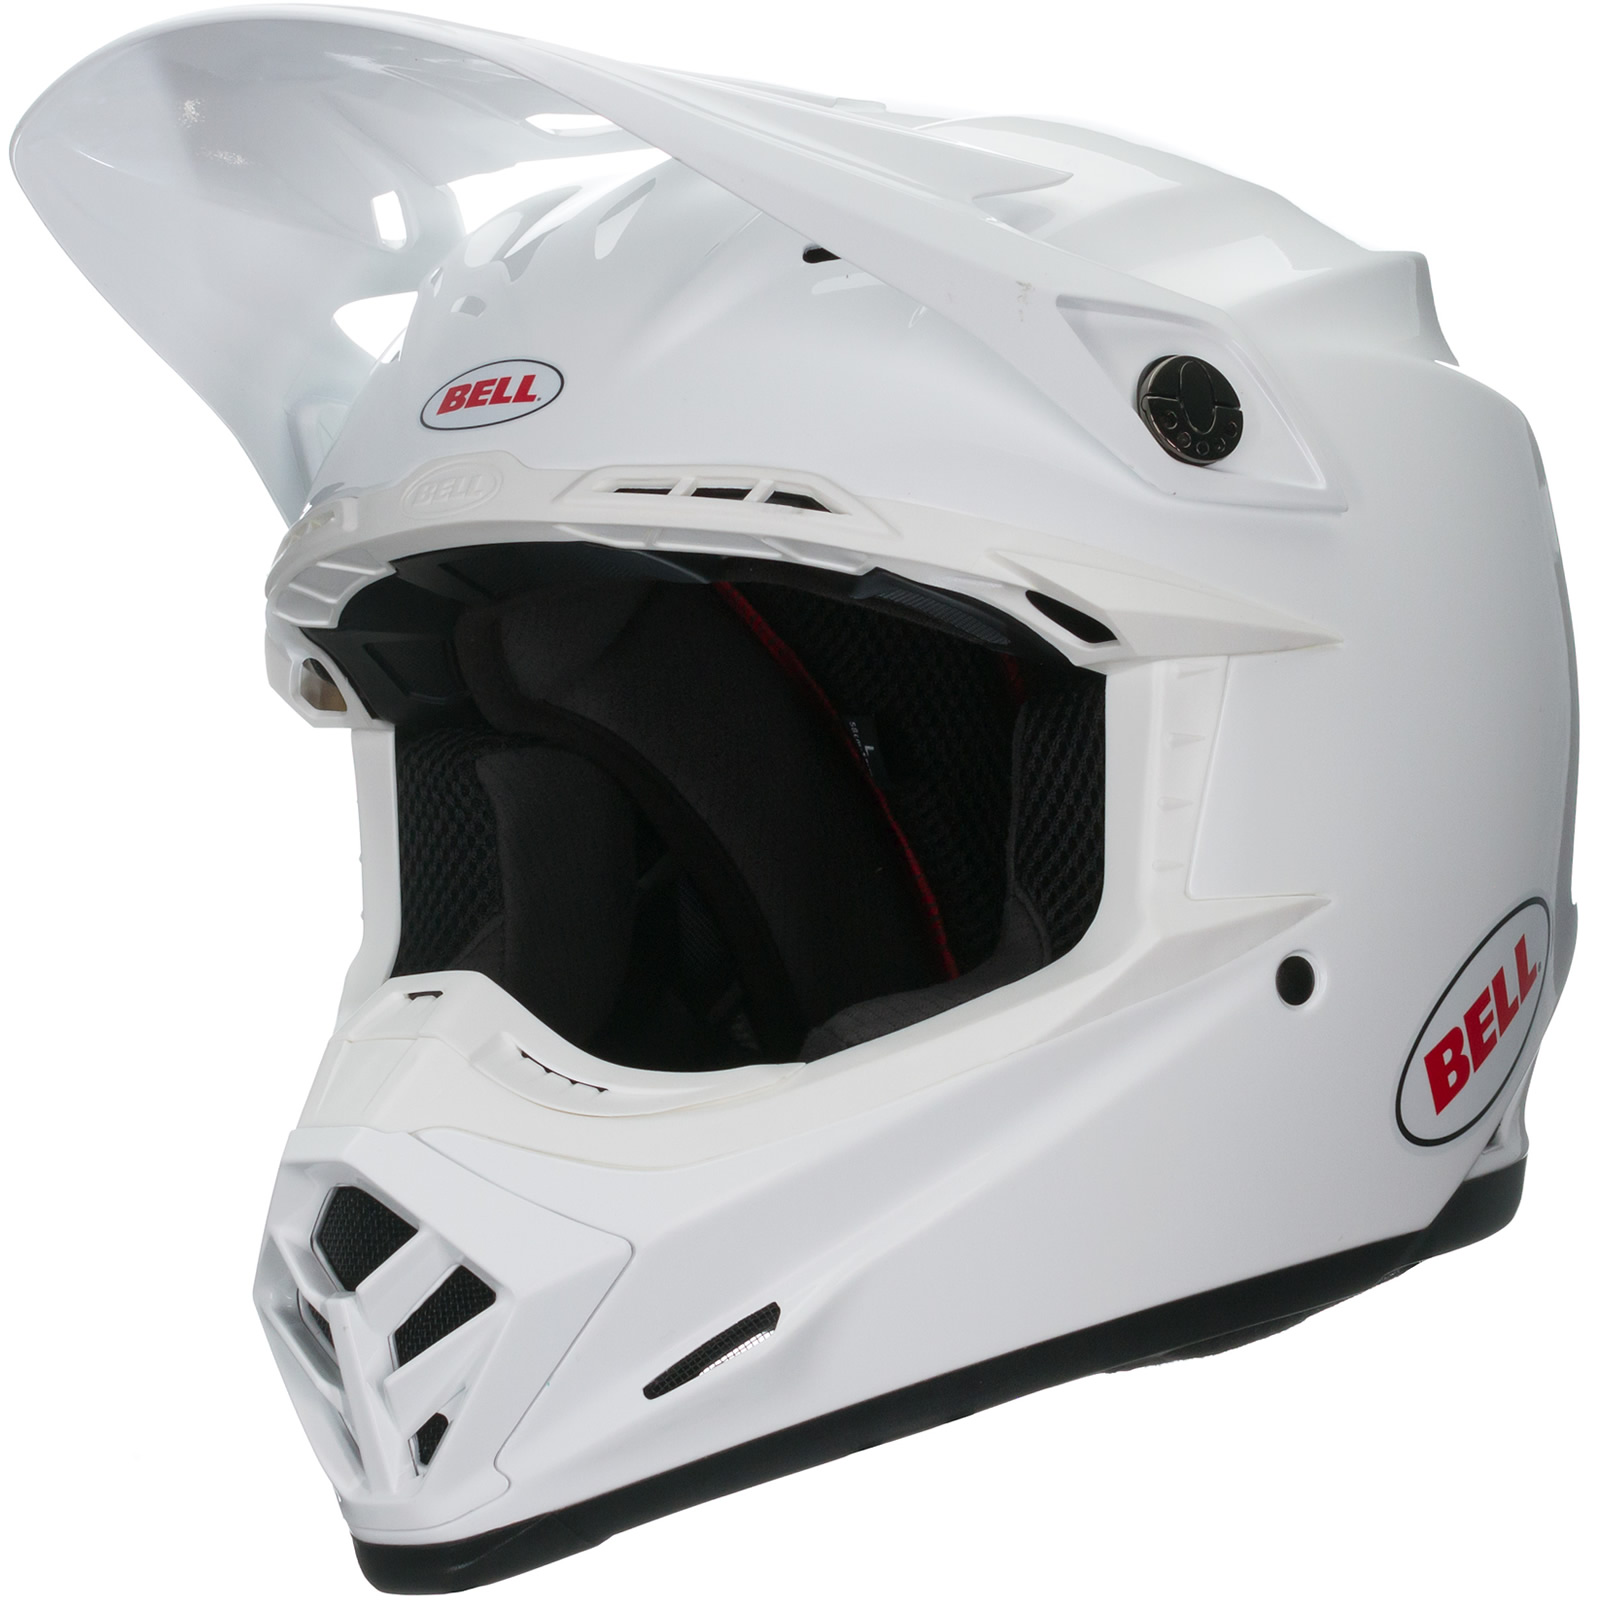 bell moto 9 solid motocross helmet mx lightweight atv vented off road warranty ebay. Black Bedroom Furniture Sets. Home Design Ideas